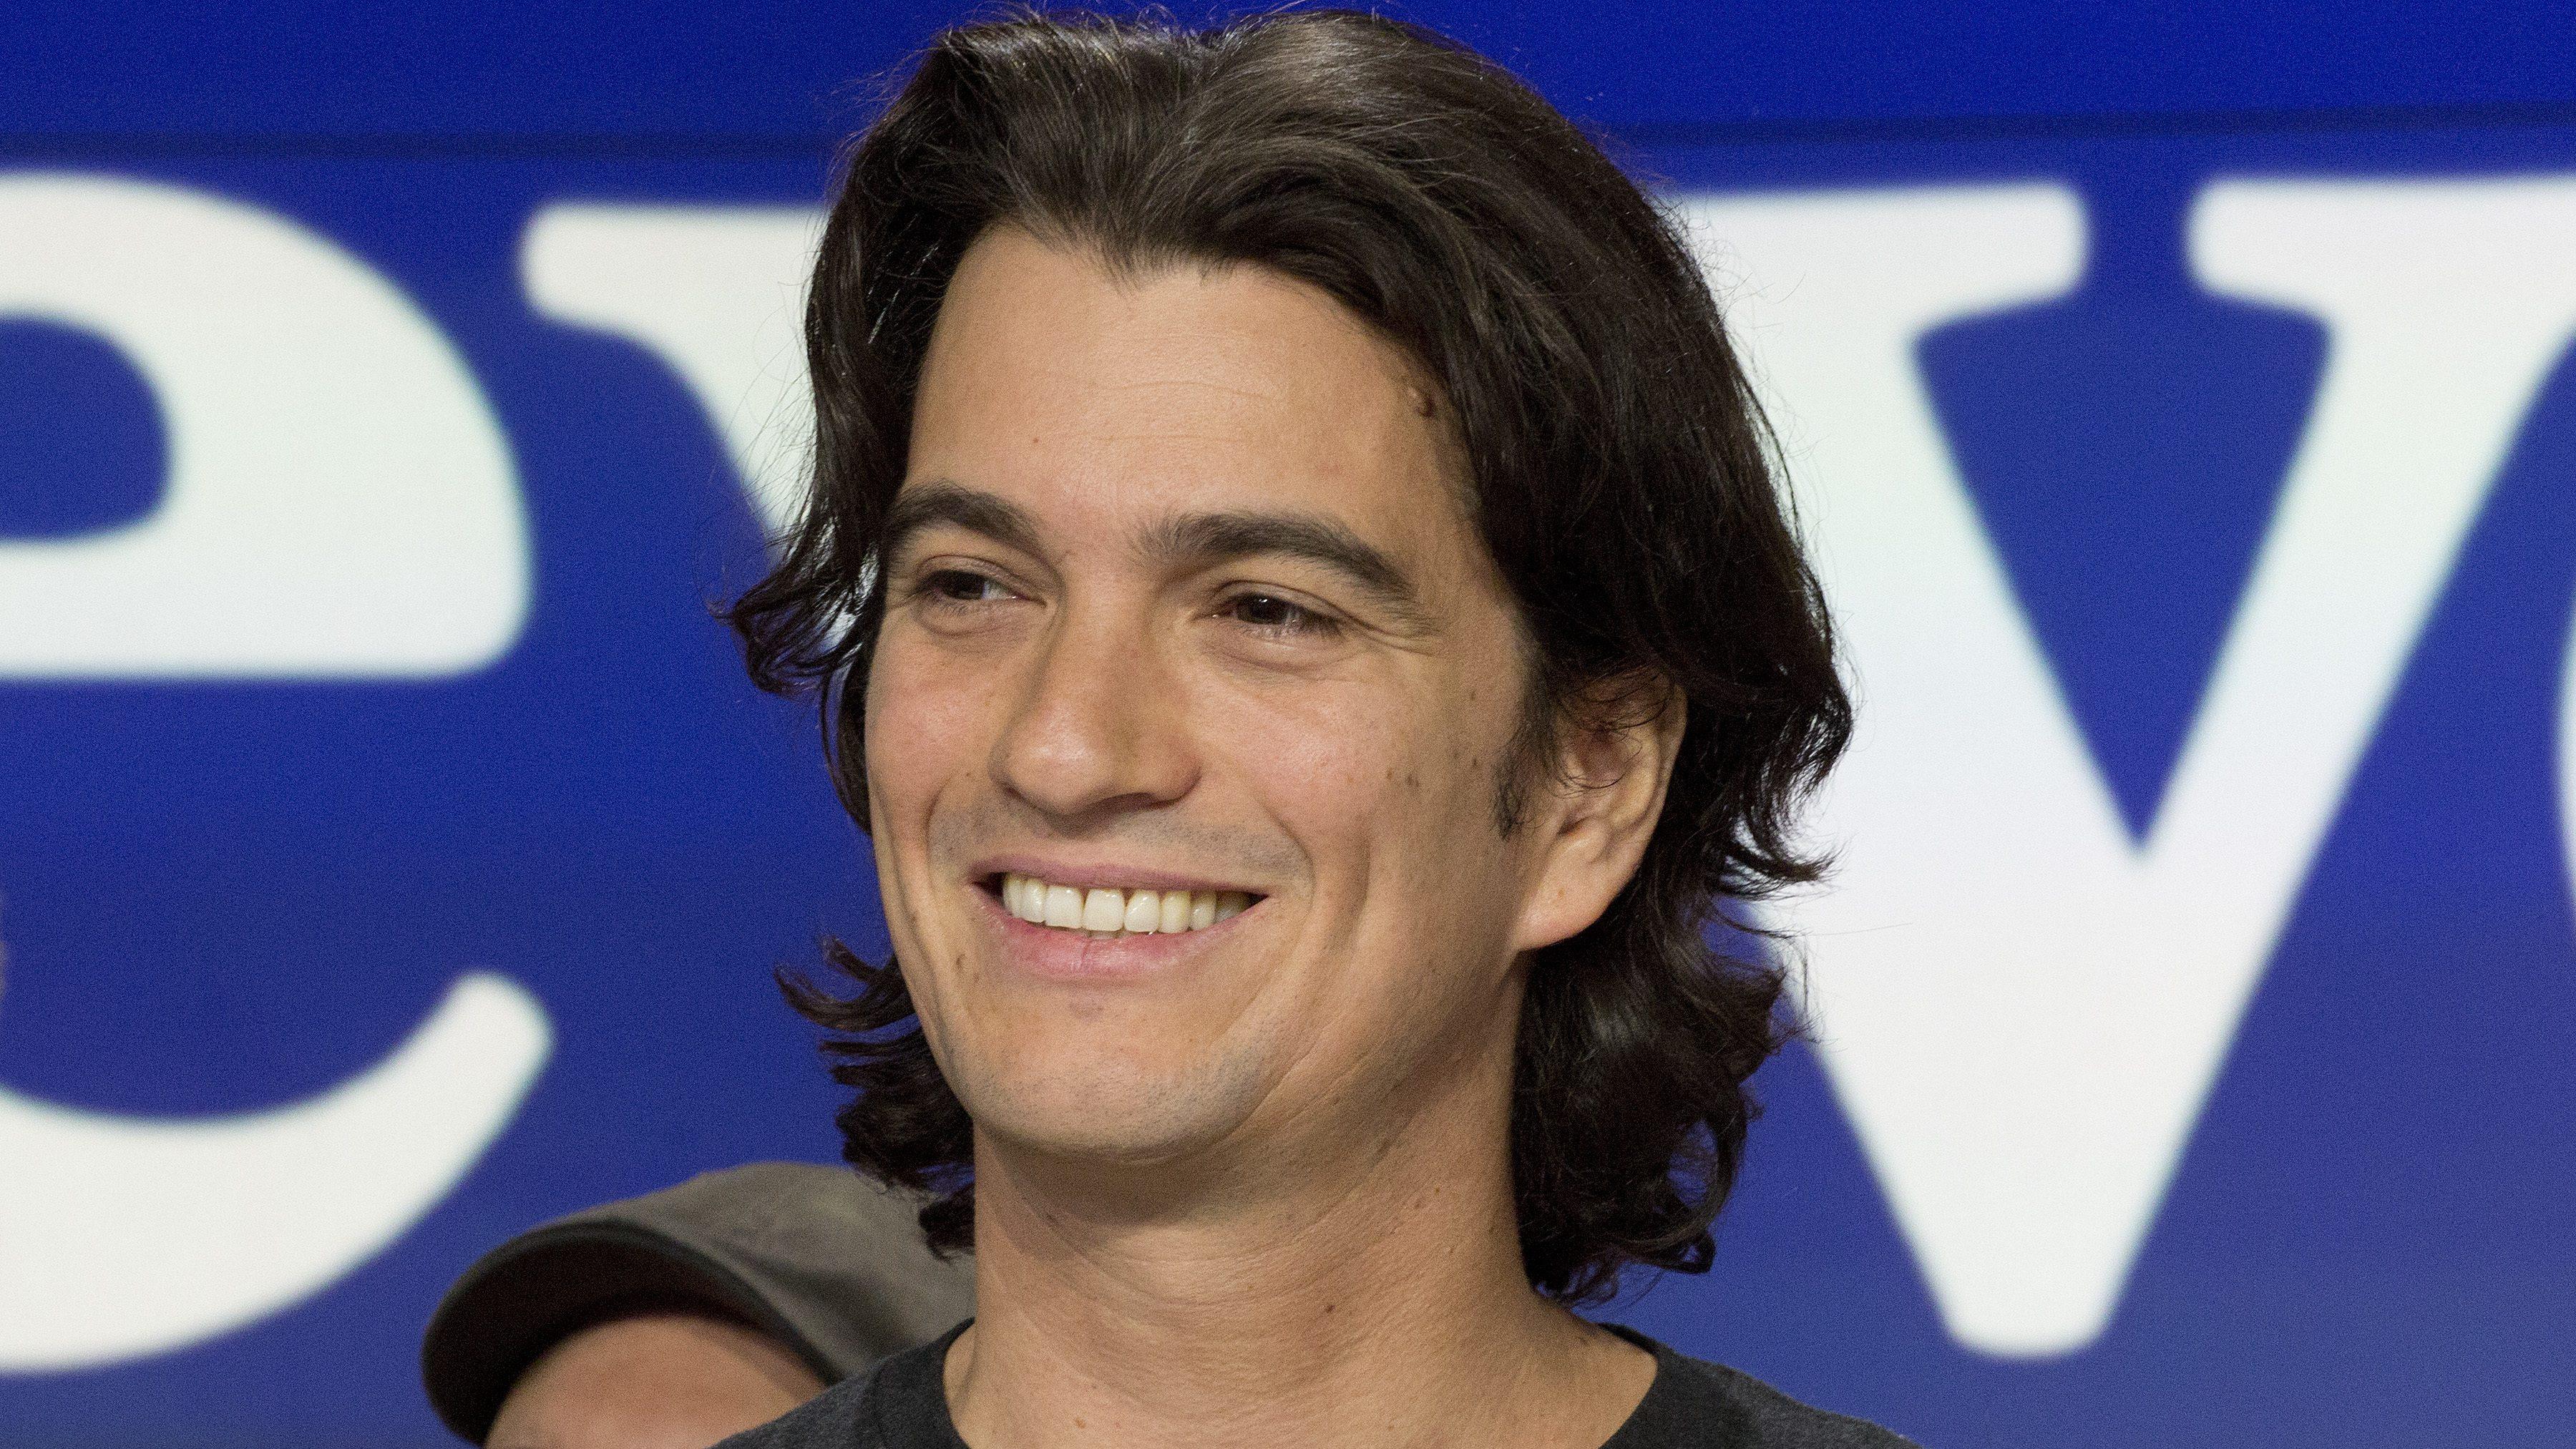 WeWork co-founder and CEO Adam Neumann